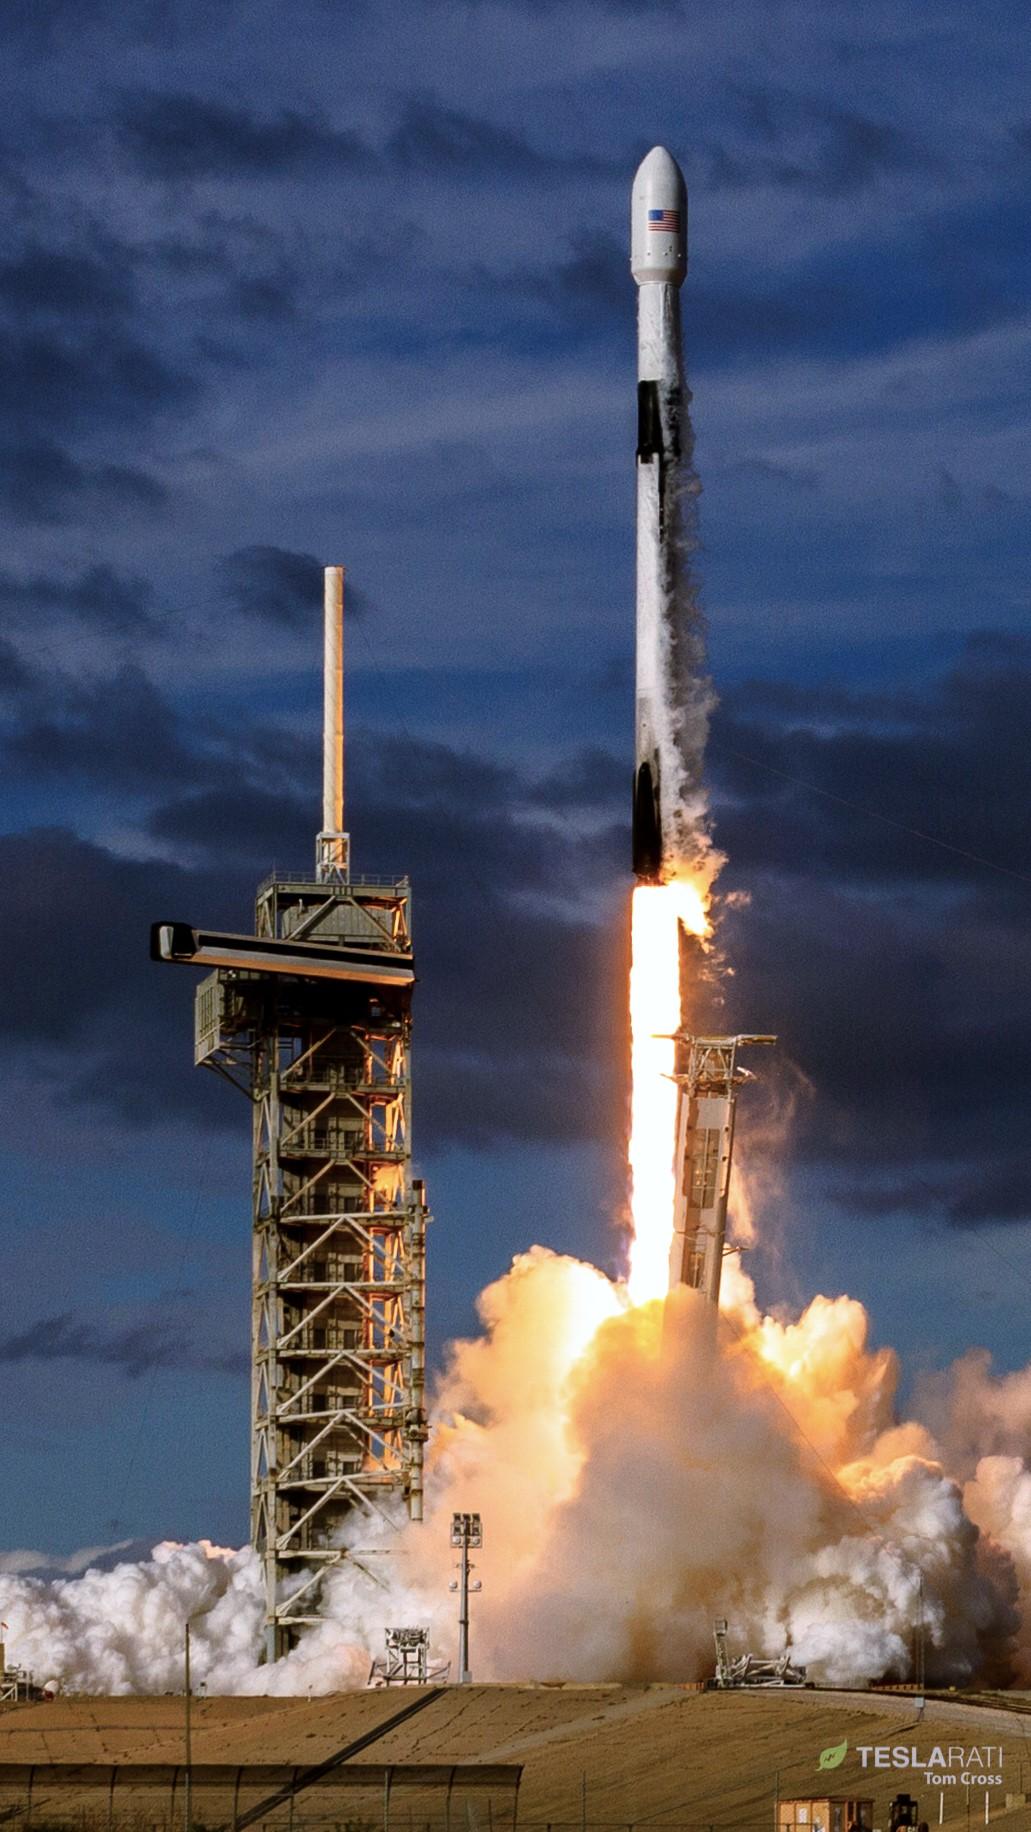 B1047 Es'hail 2 launch (Tom Cross) 7